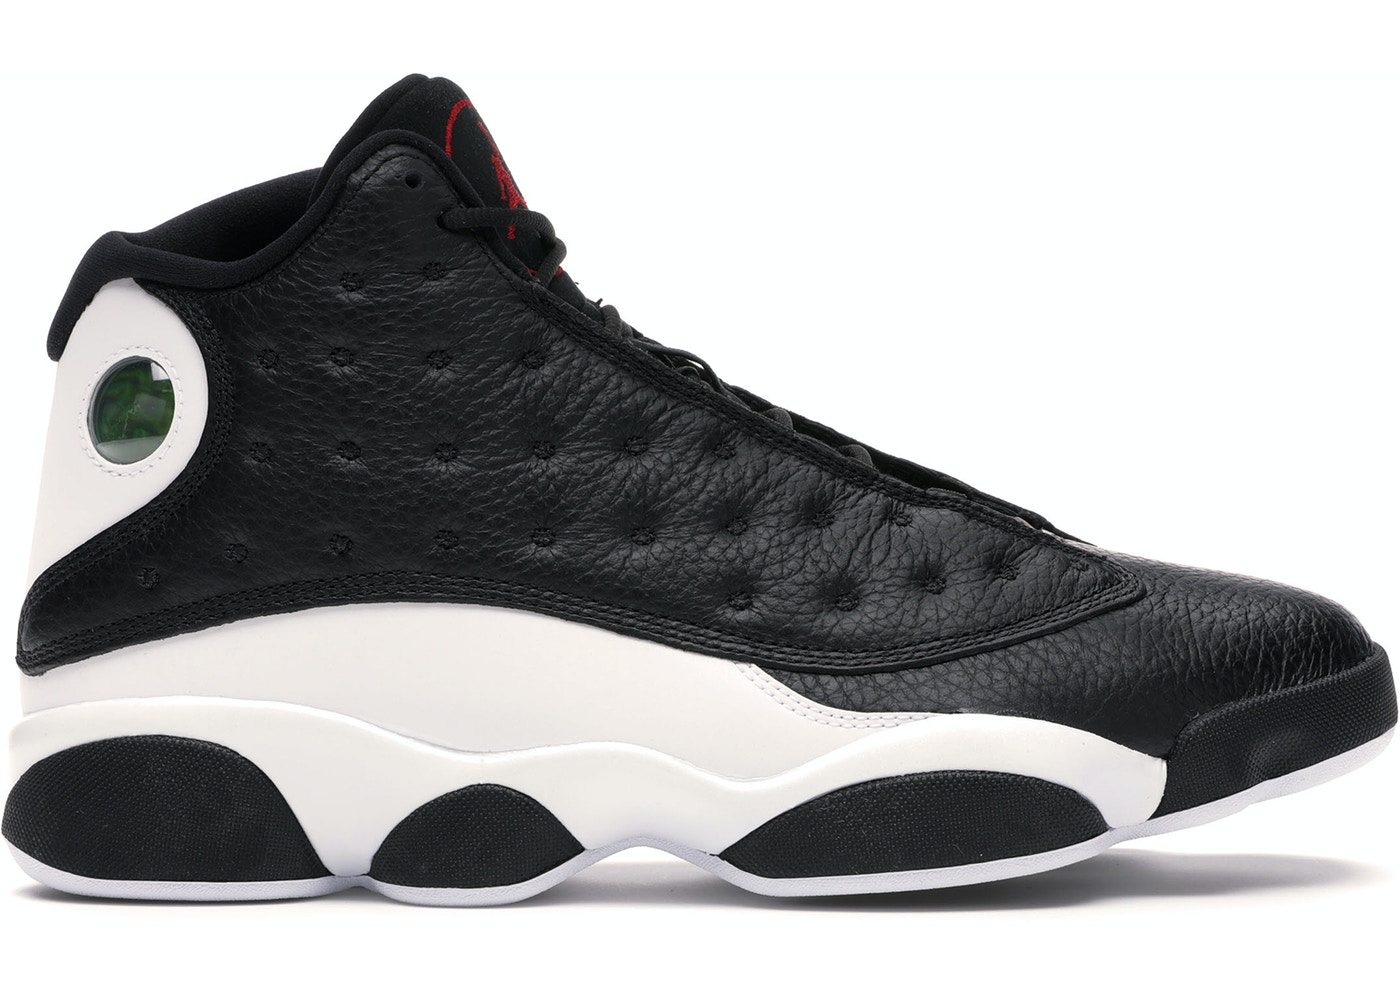 Jordan 13 Retro Reverse He Got Game 414571 061